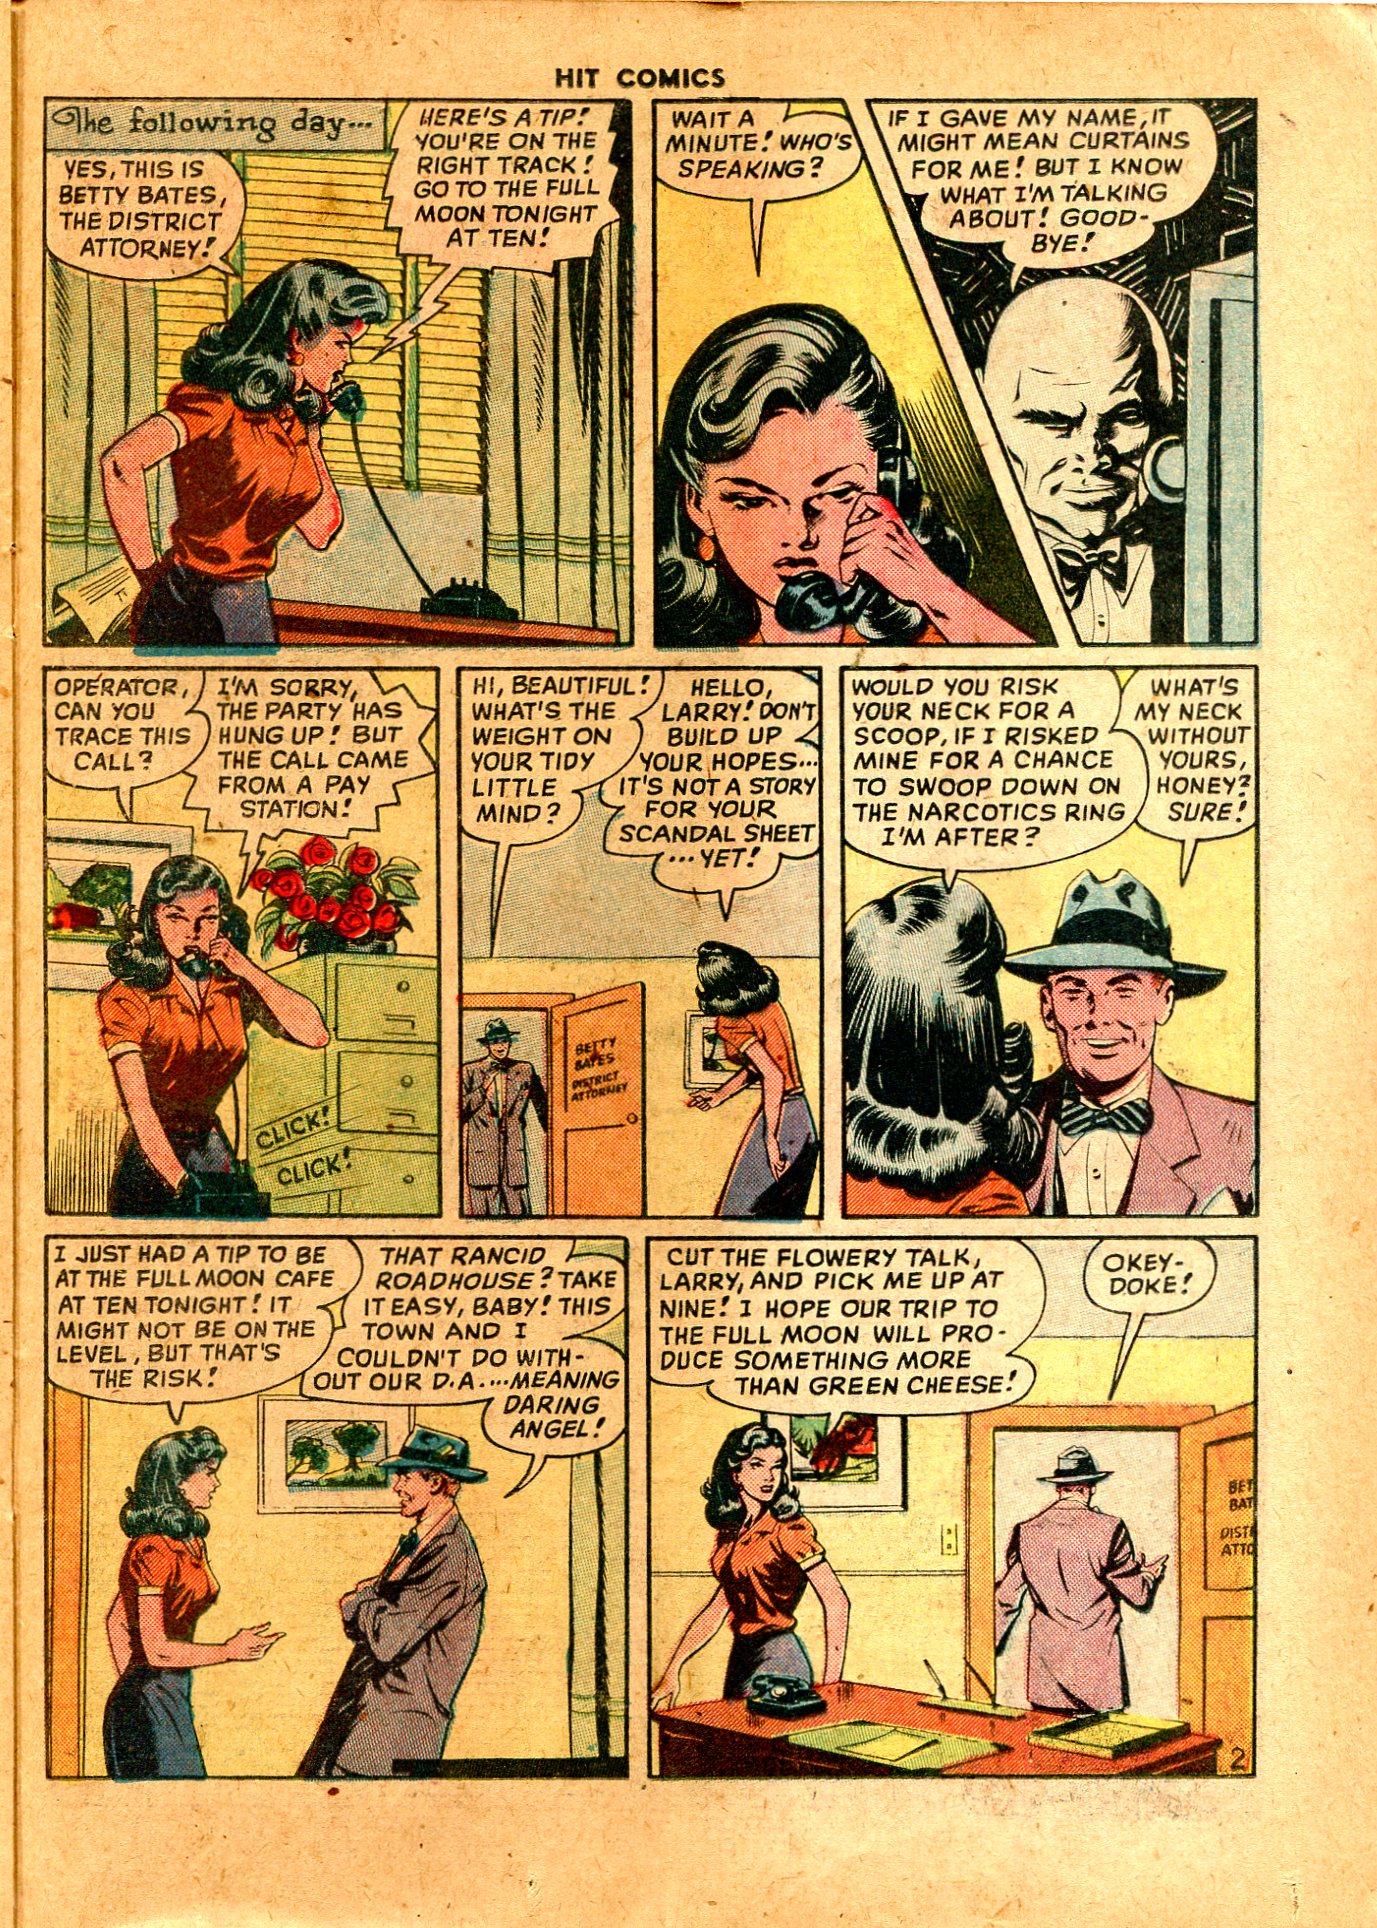 Read online Hit Comics comic -  Issue #57 - 33